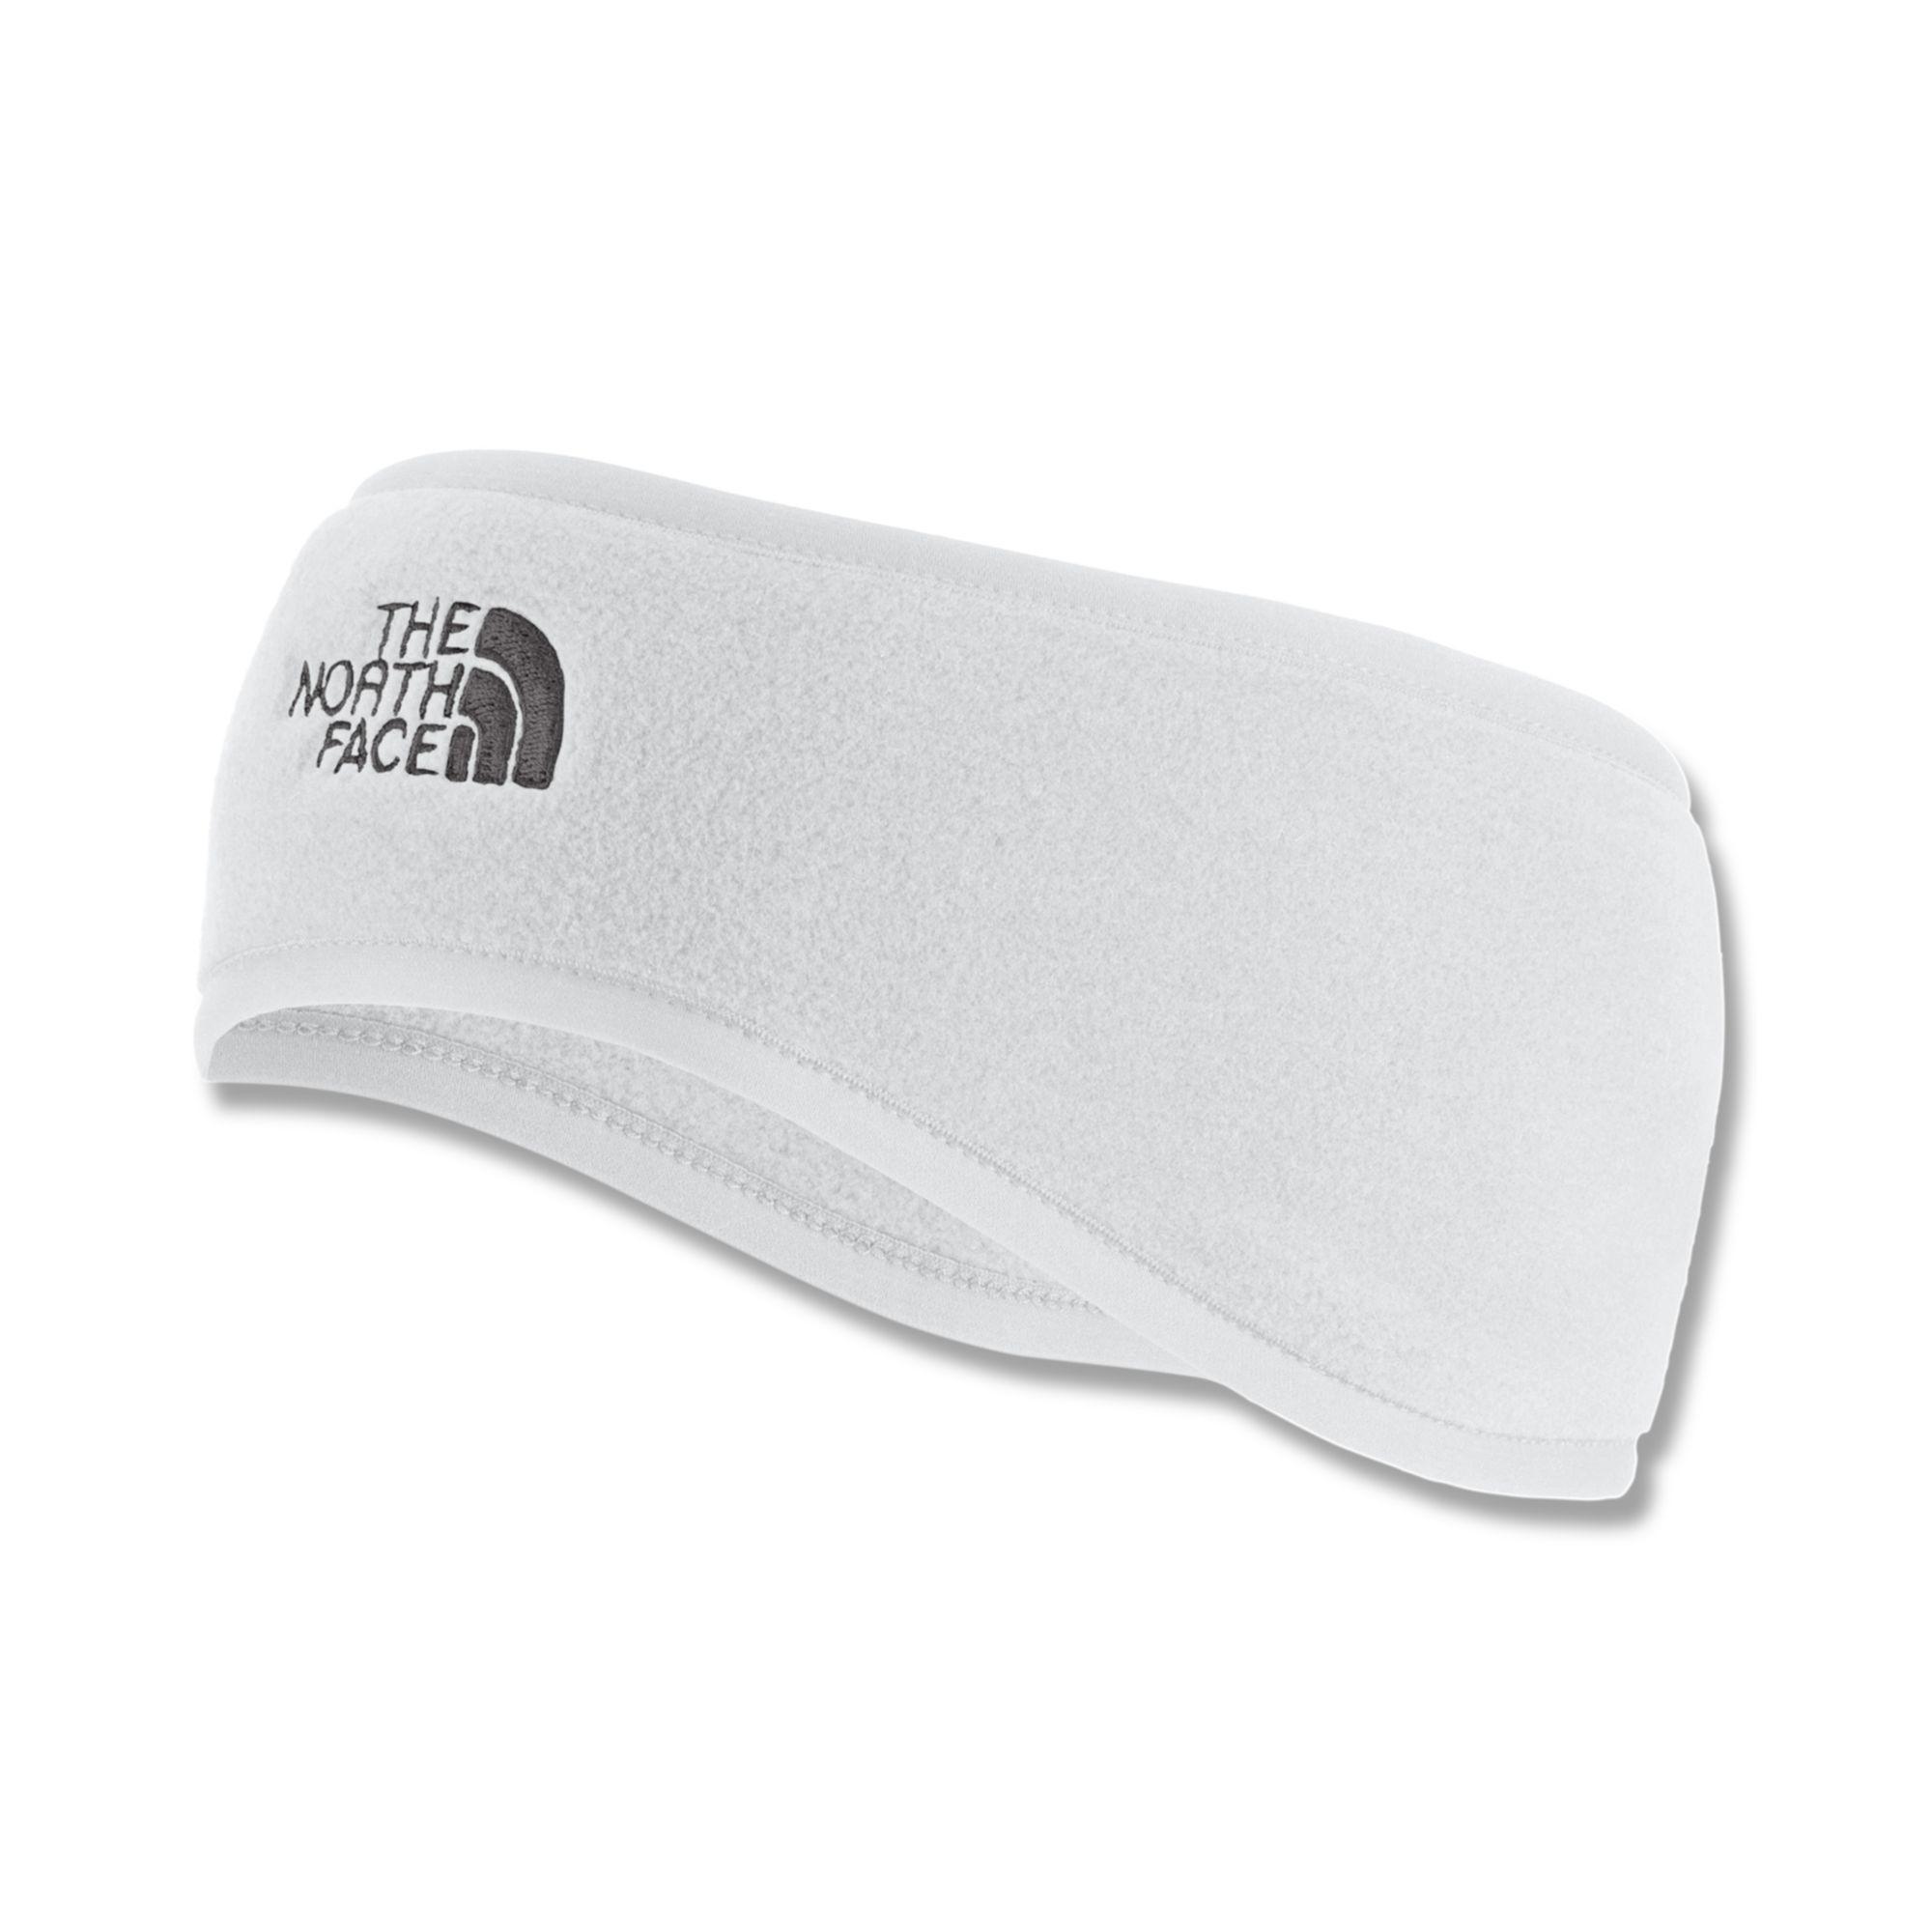 dc0653e6a The North Face Gray Standard Issue Fleece Ear Warmer